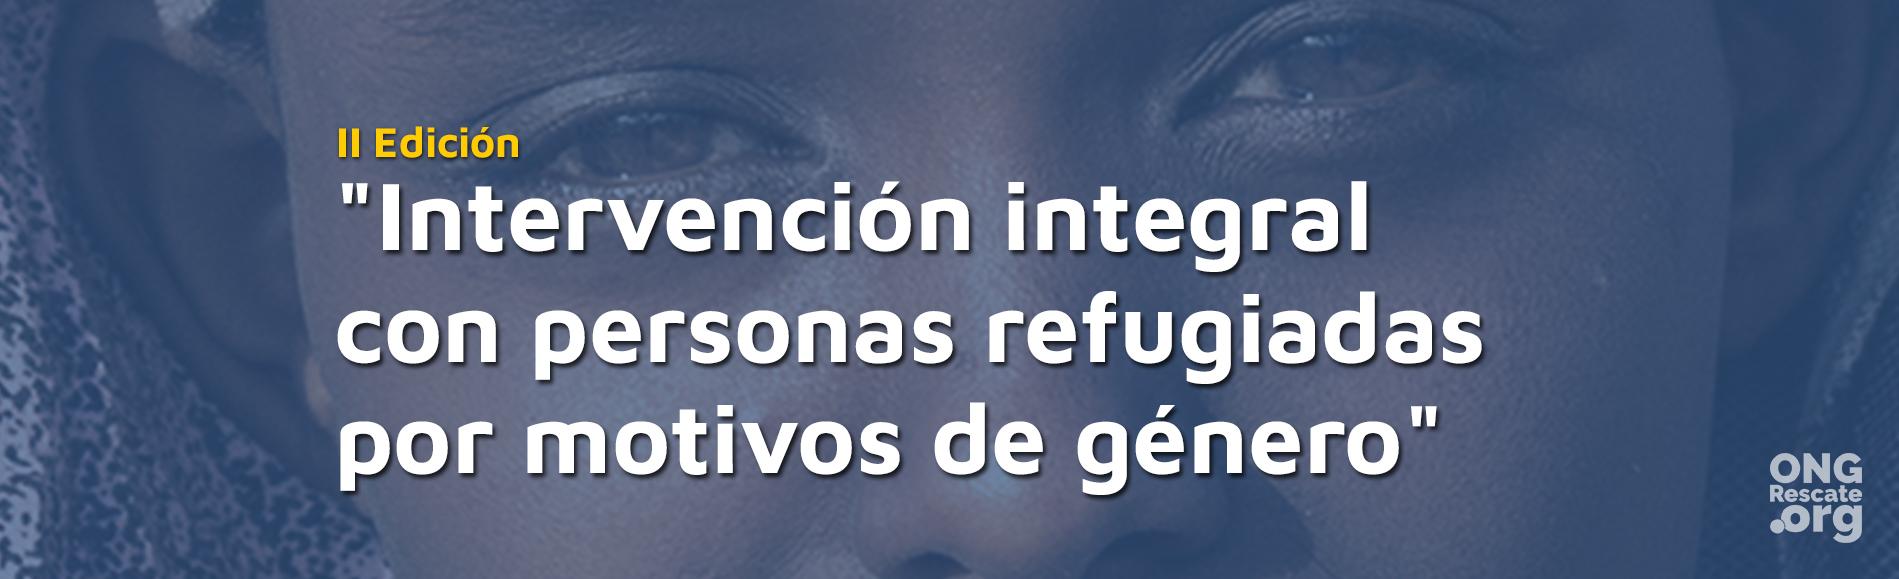 Intervención integral con personas refugiadas por motivos de género